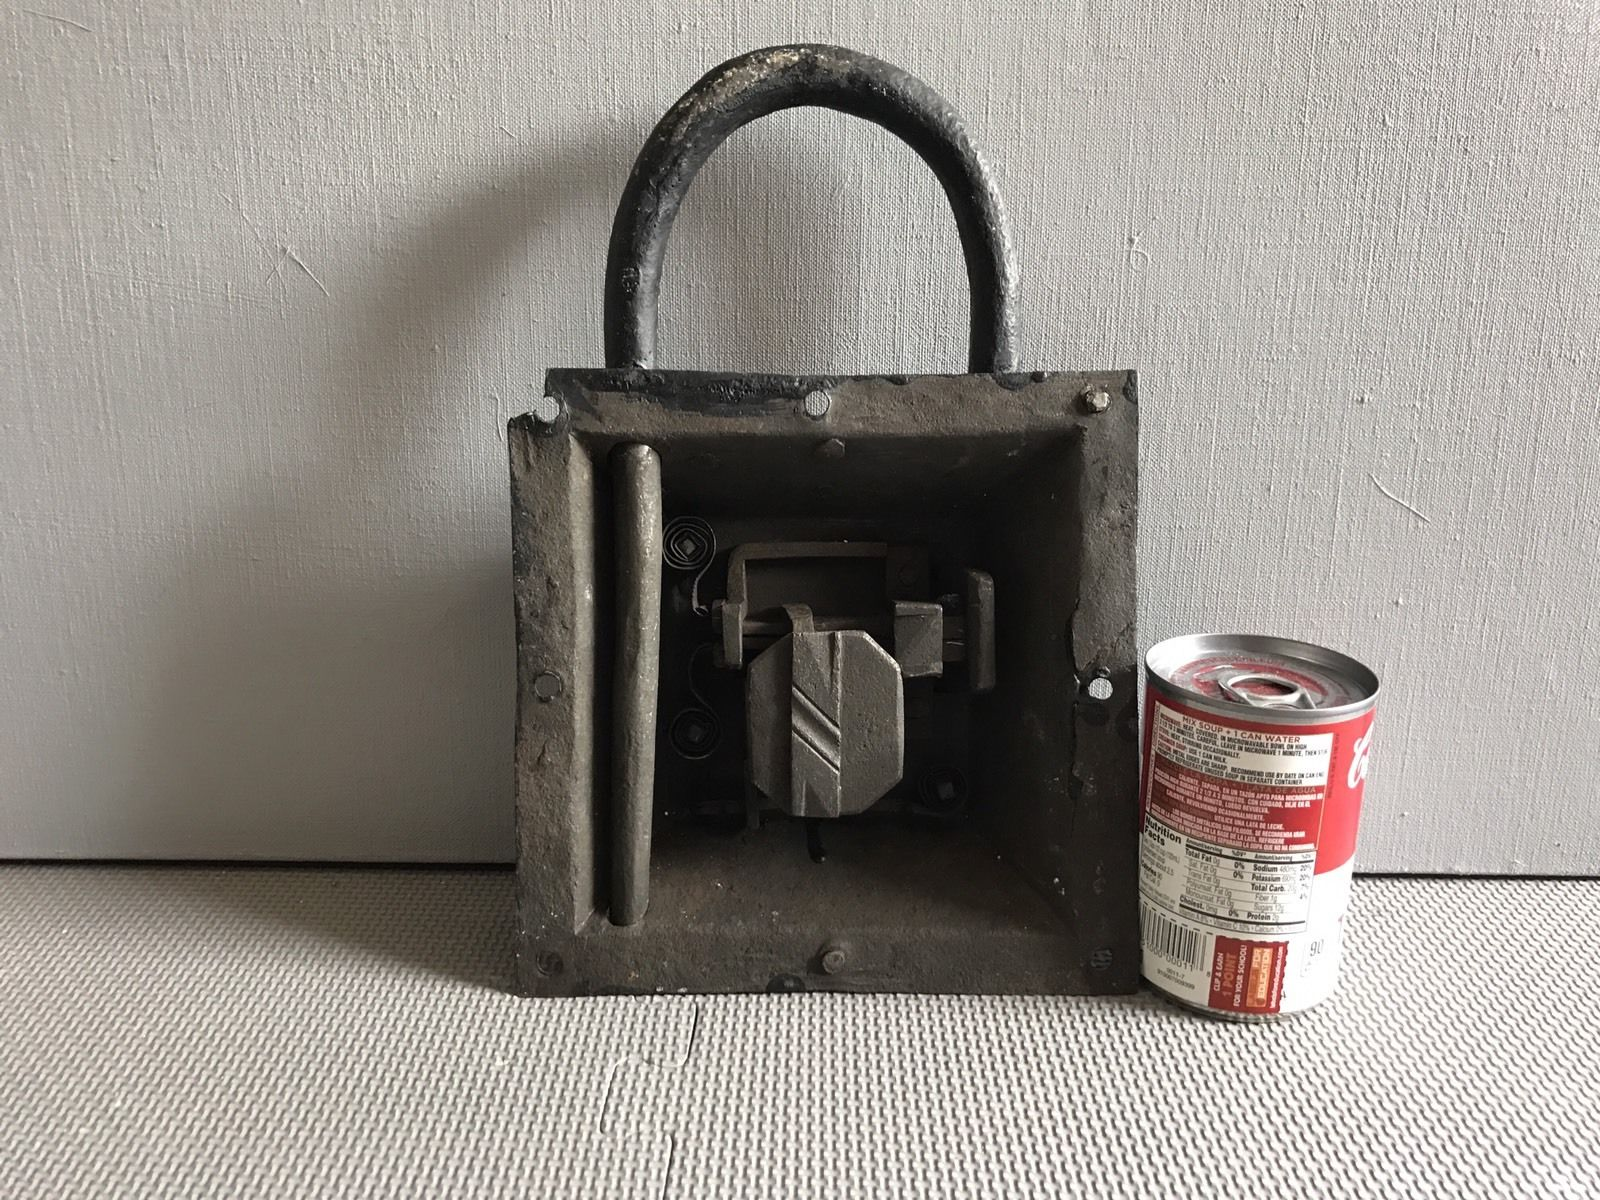 teremok_antiques_medieval_padlock_1.jpg